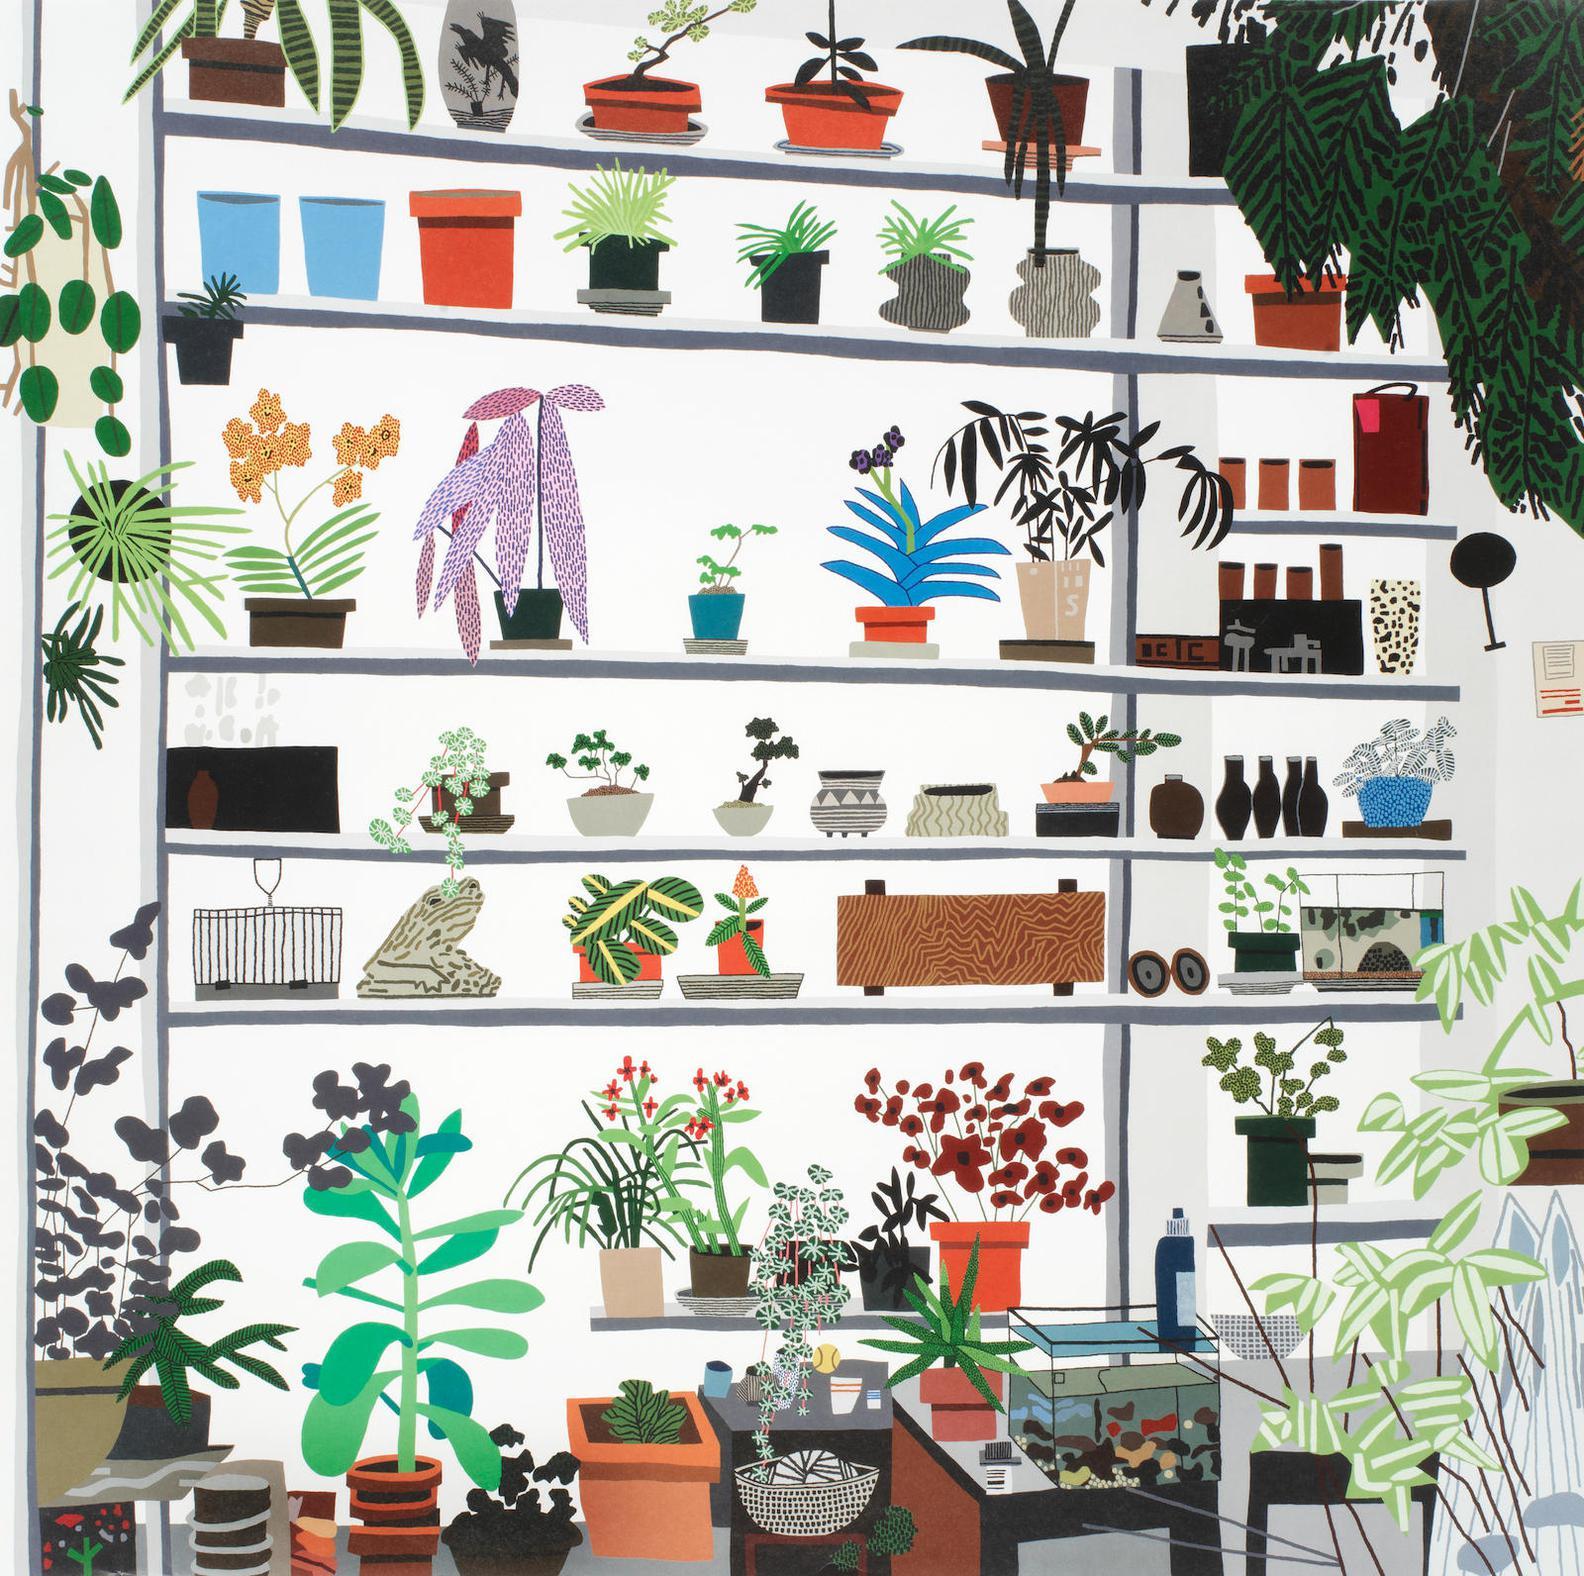 Jonas Wood-Large Shelf Still Life-2017